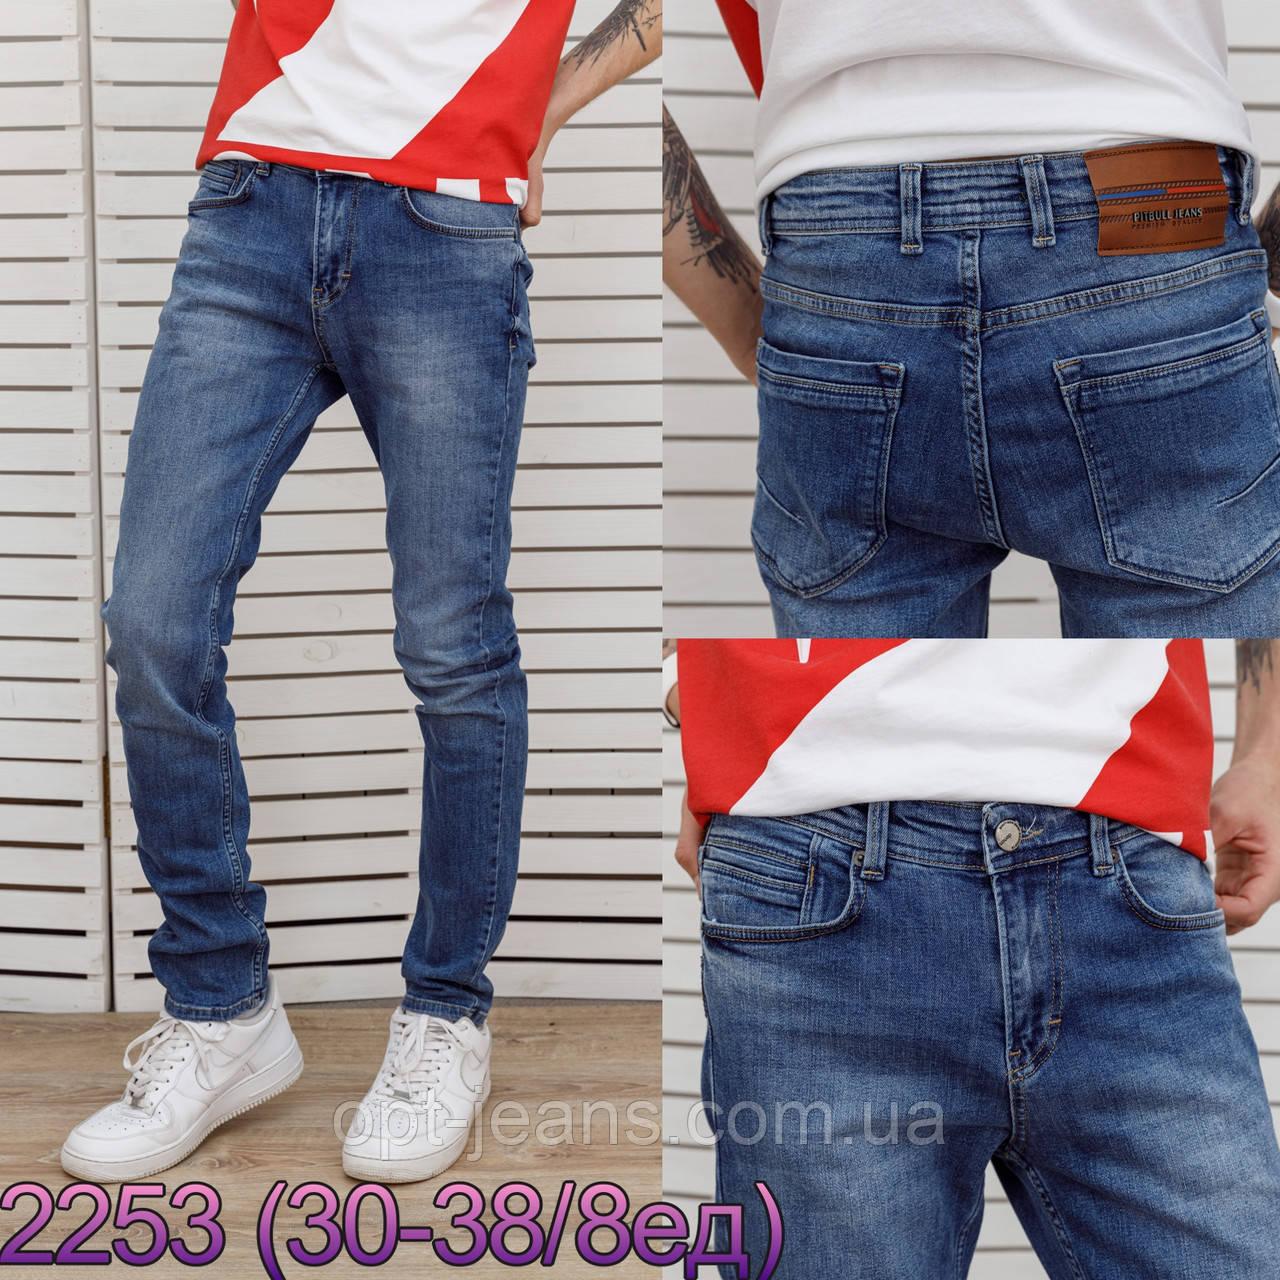 Pitbull мужские джинсы (30-38/8шт.)